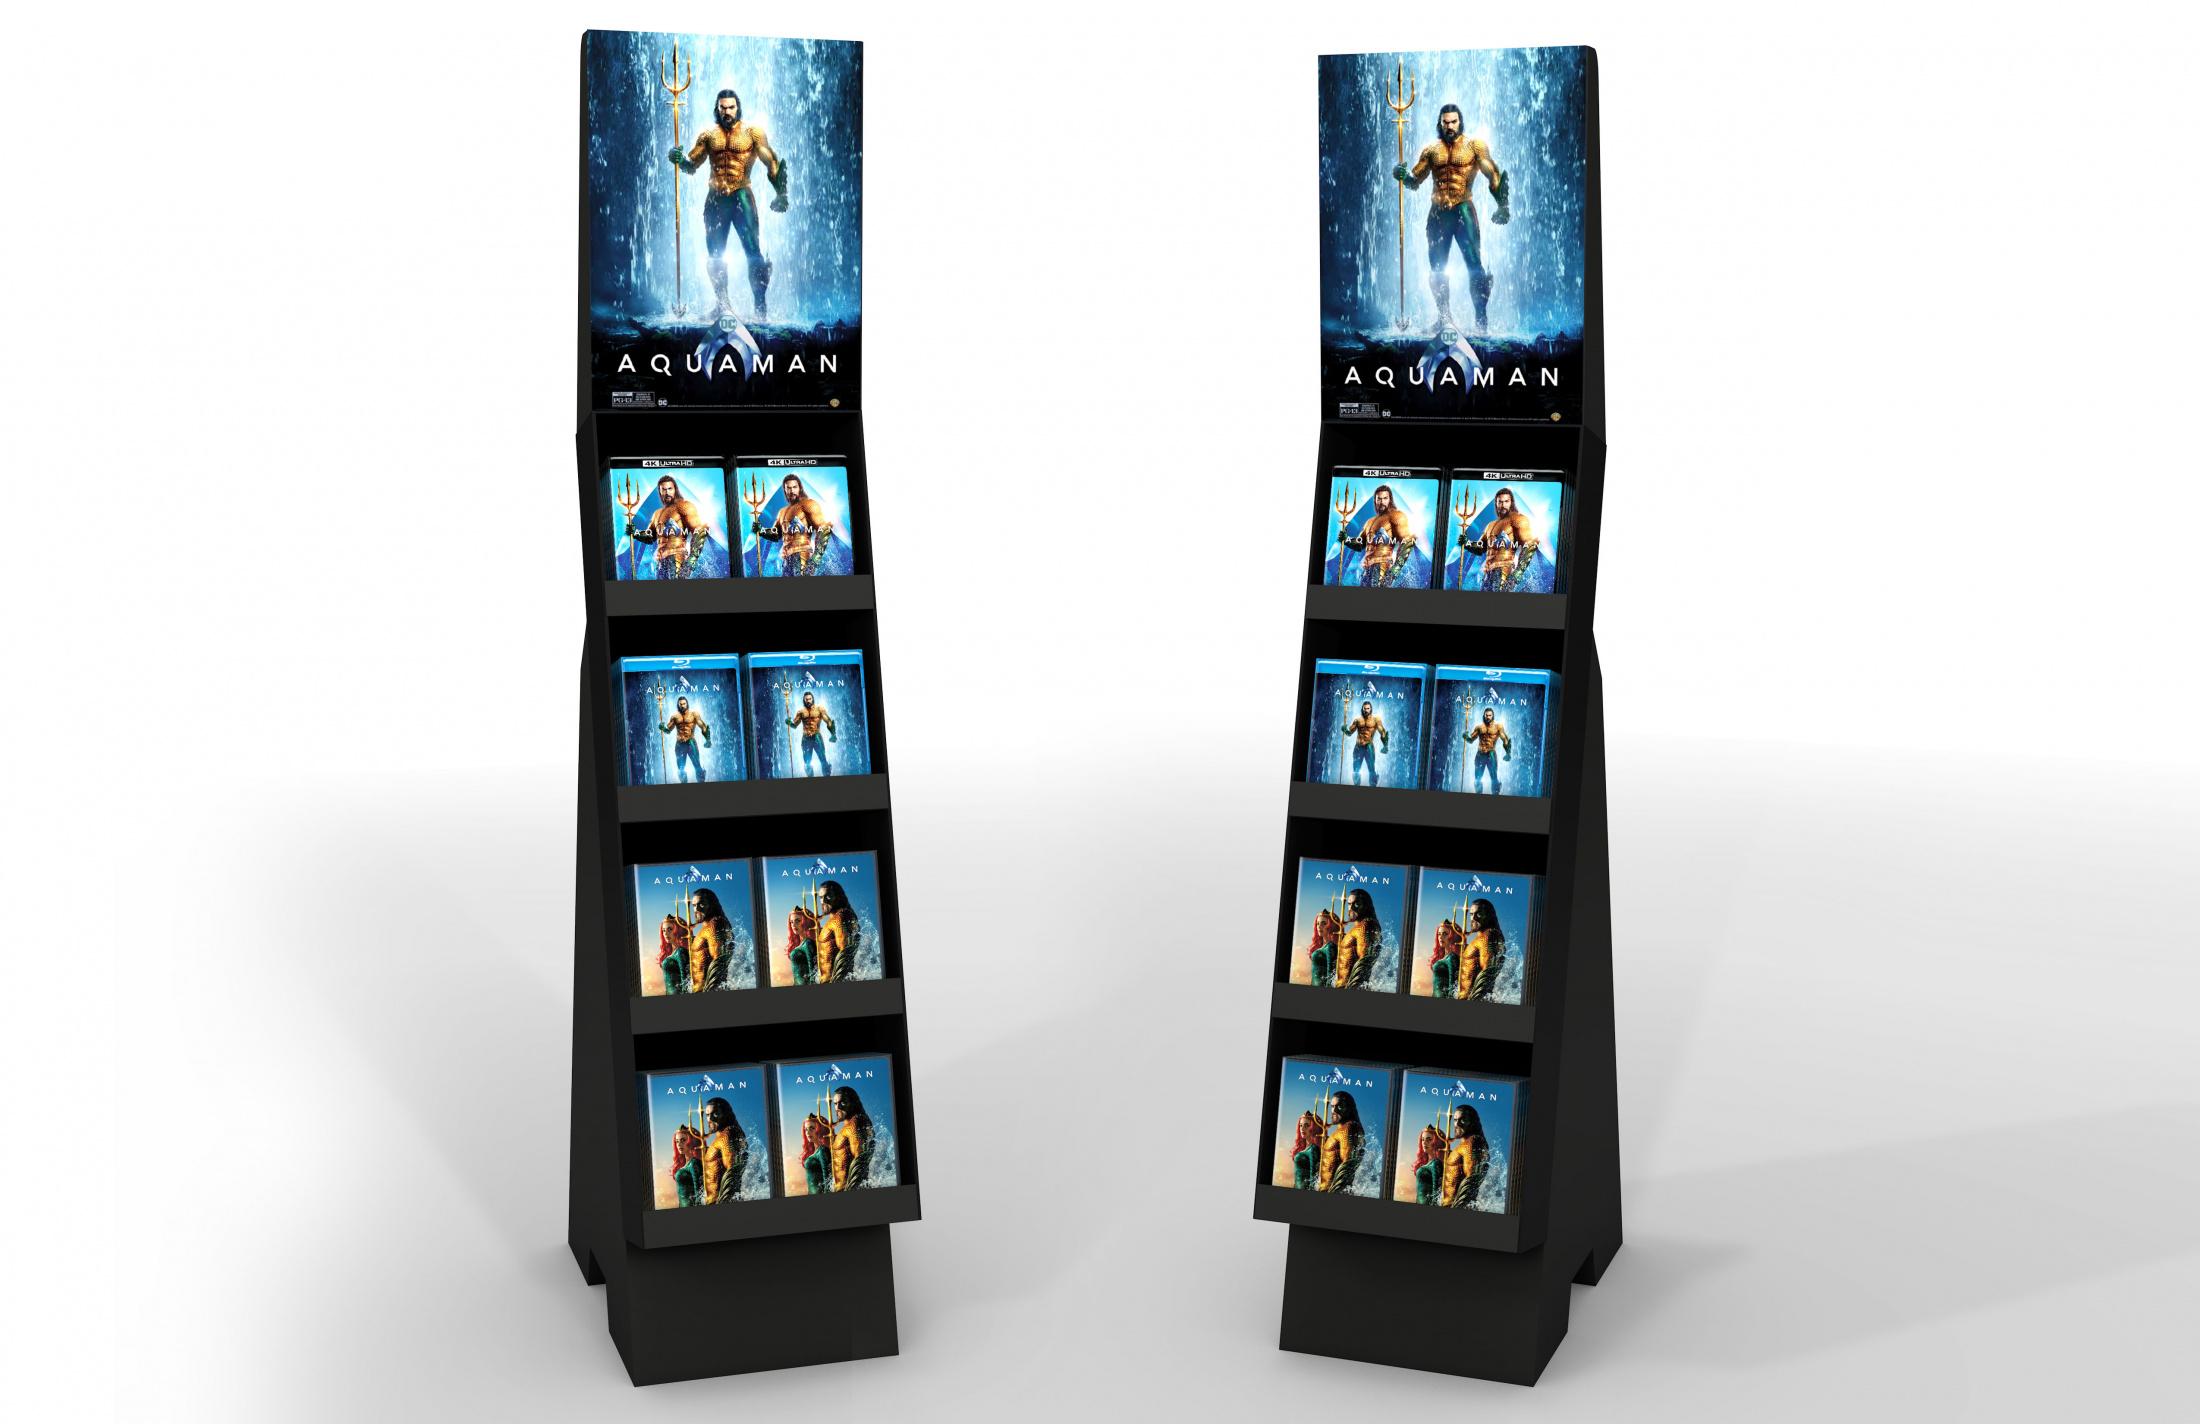 Thumbnail for Aquaman Home Entertainment Shoppable Floor Display Non Event